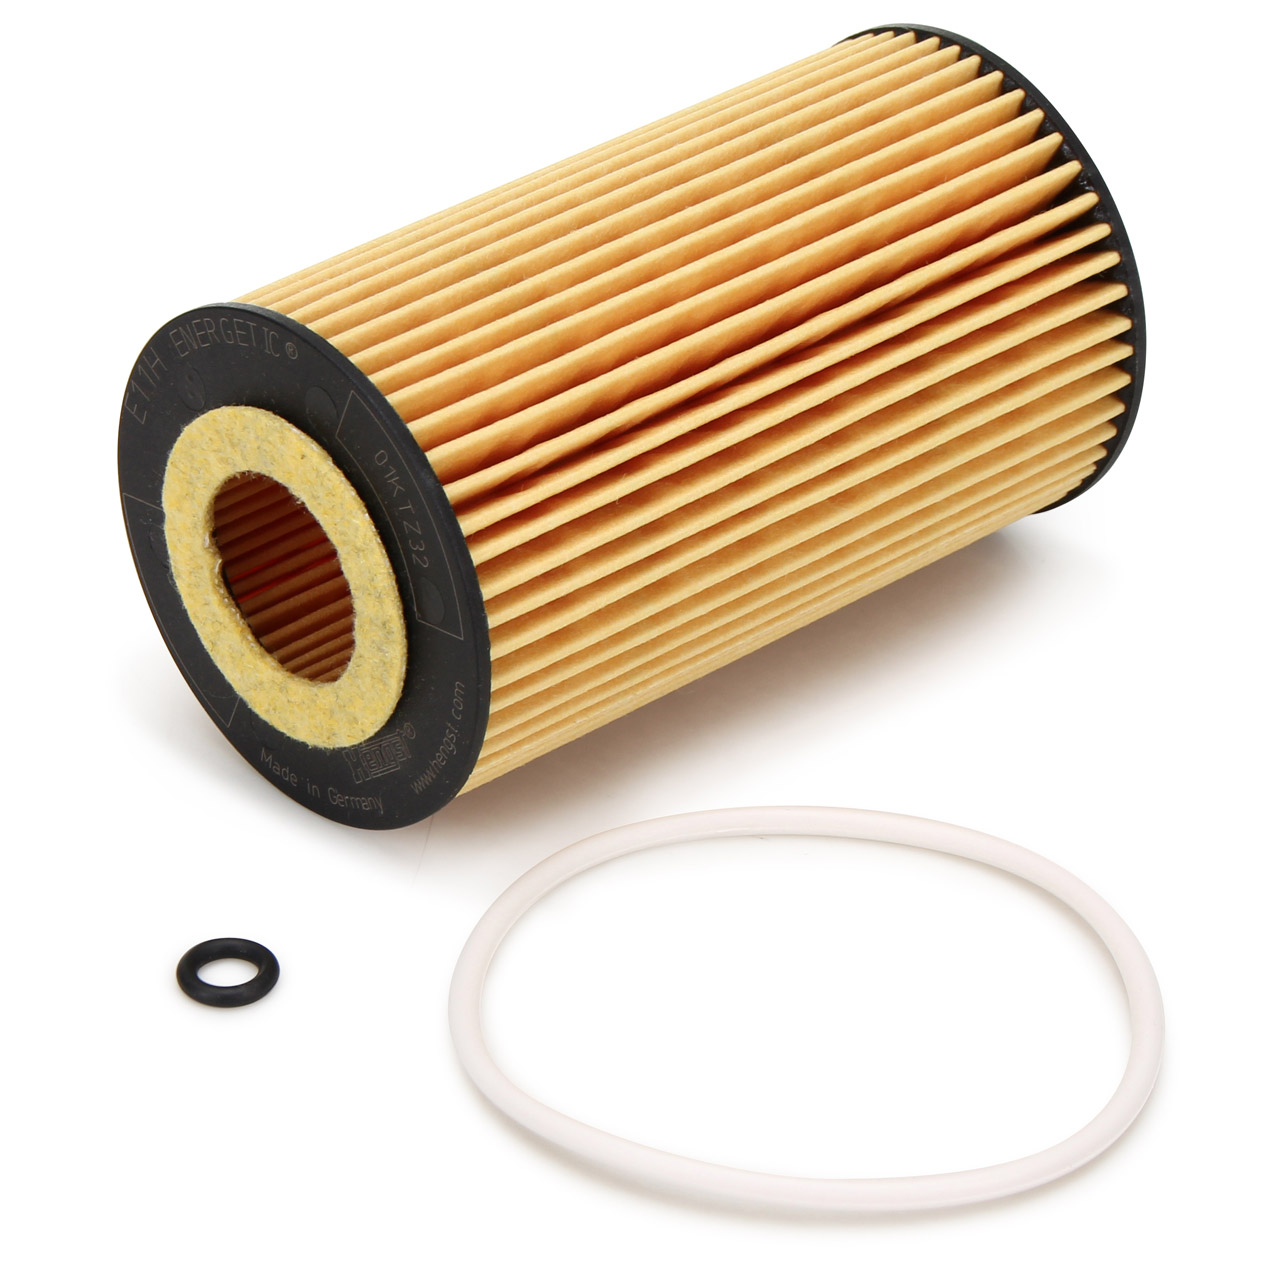 Inspektionskit Filterpaket Filterset für Opel Signum Vectra C 2.0DTI 2.2DTI